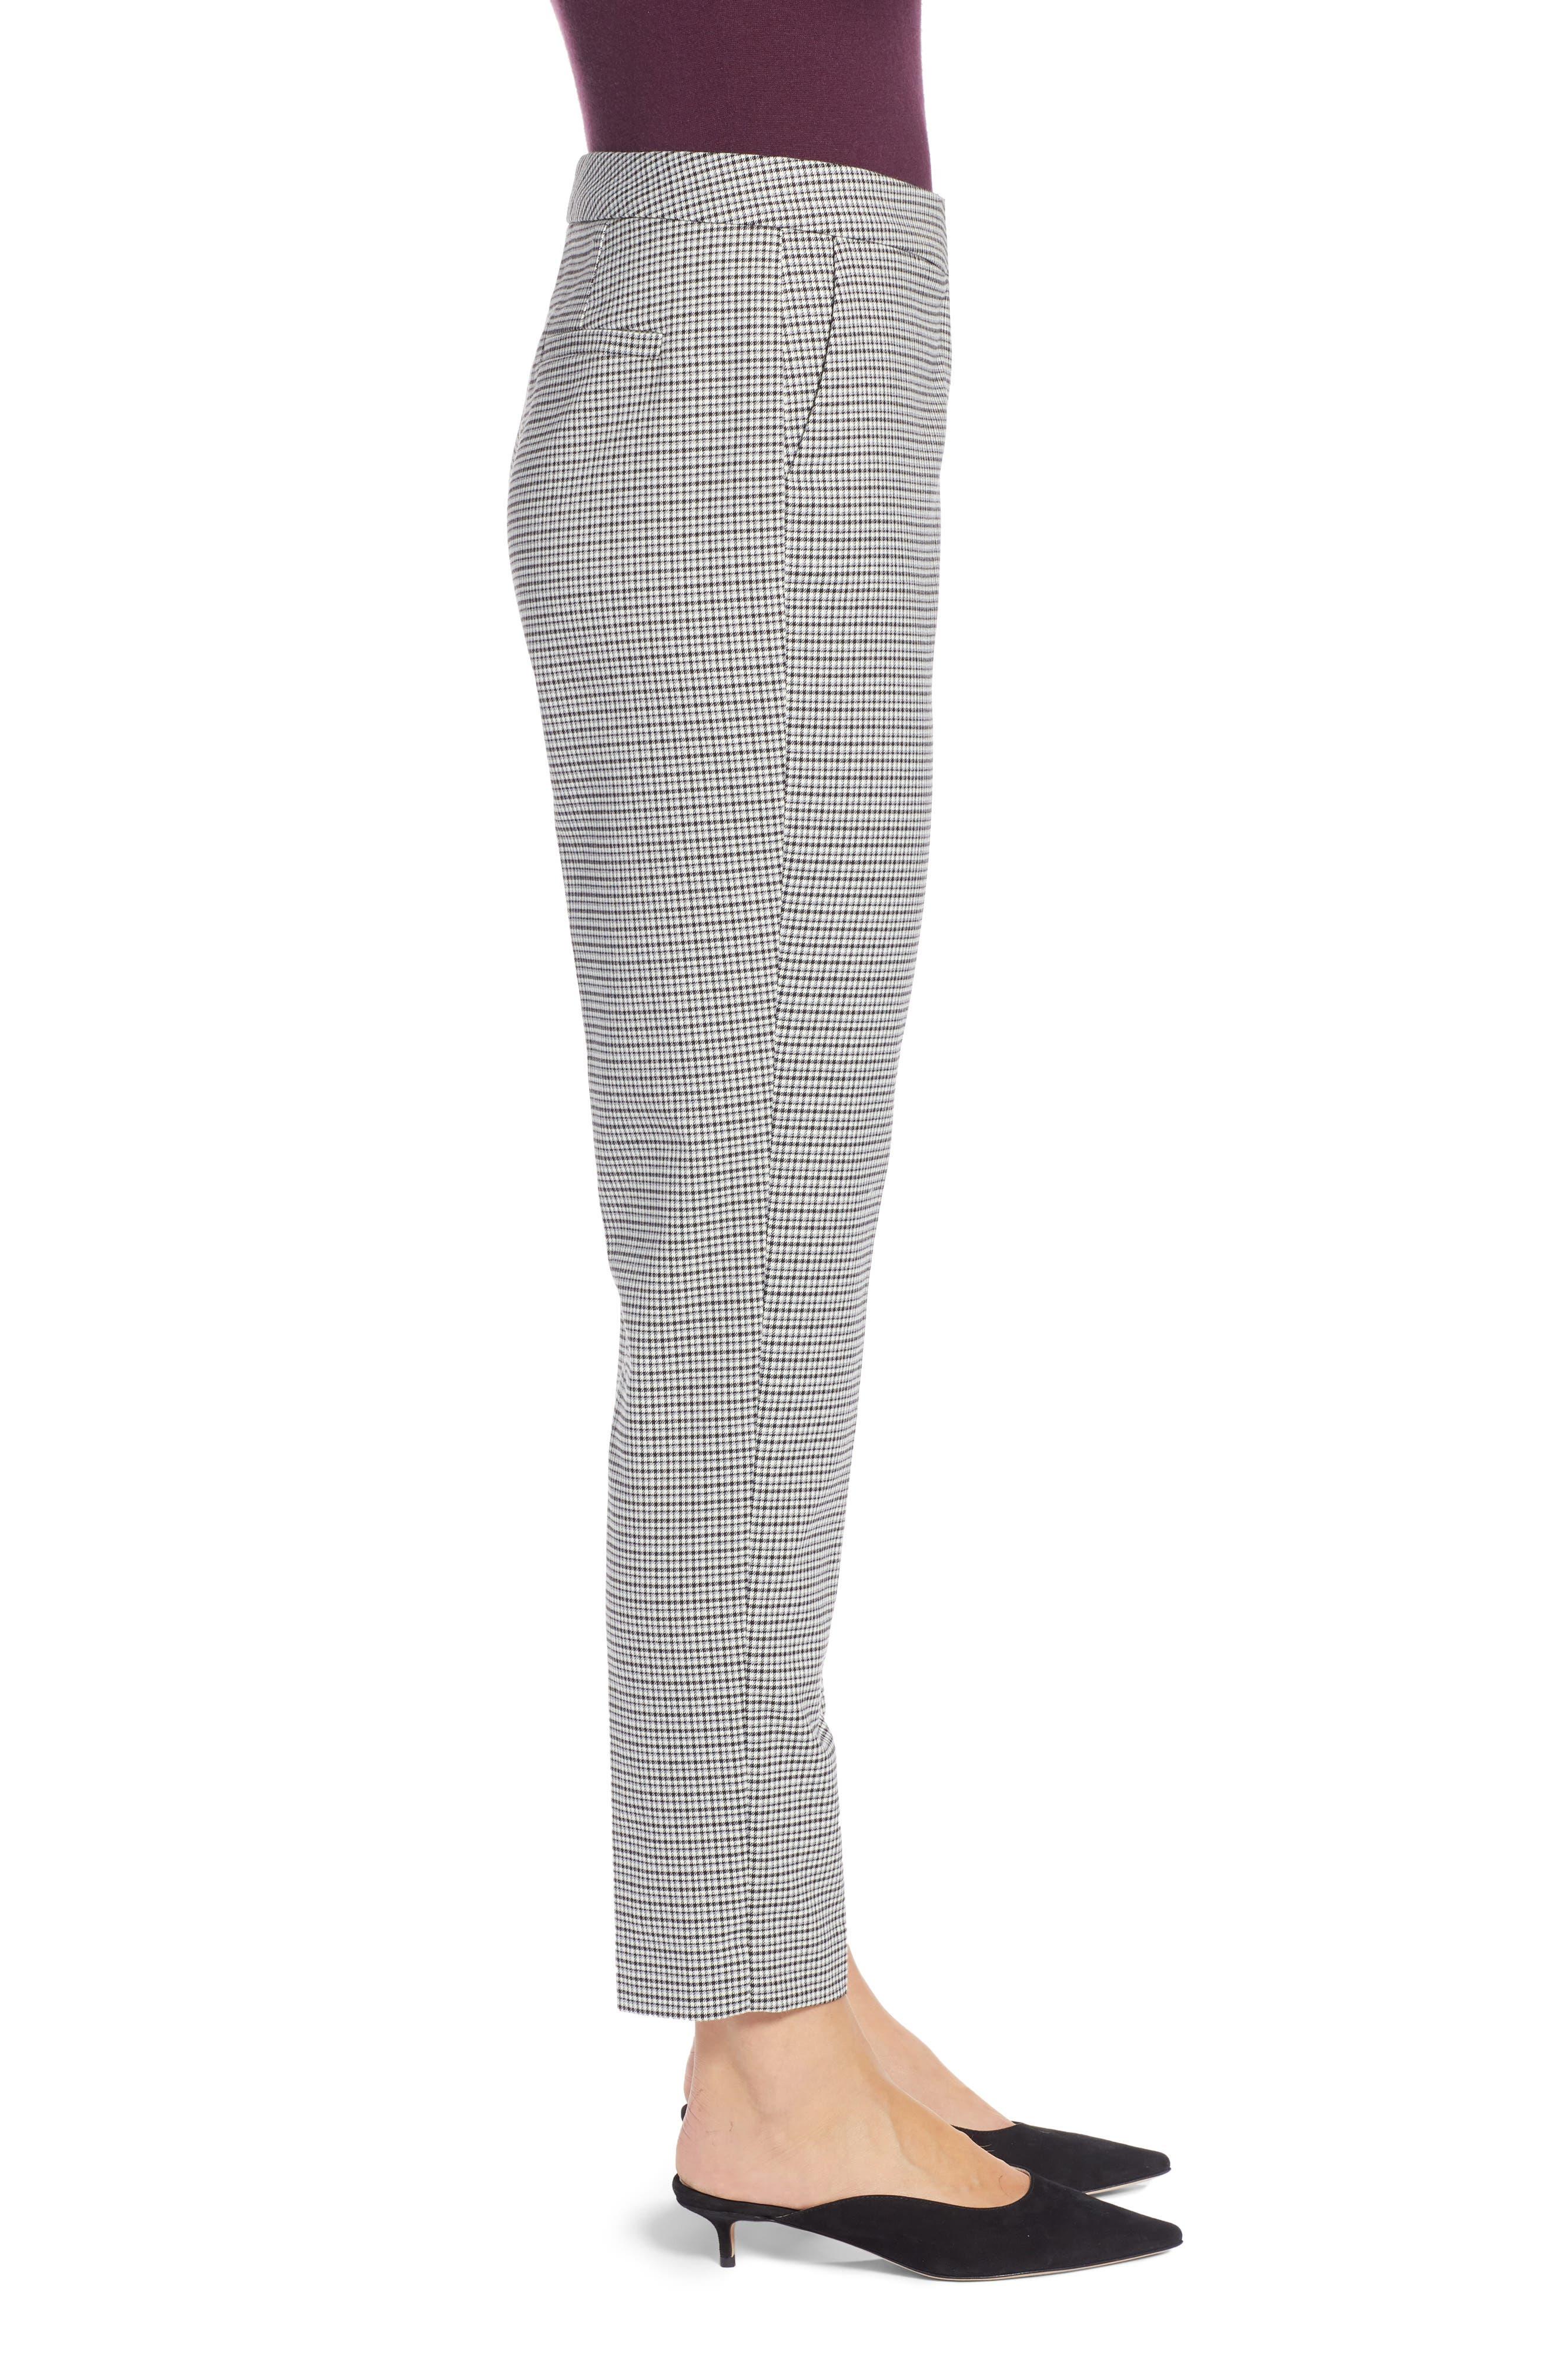 High Rise Skinny Ankle Pants,                             Alternate thumbnail 4, color,                             BLACK- IVORY PATTERN